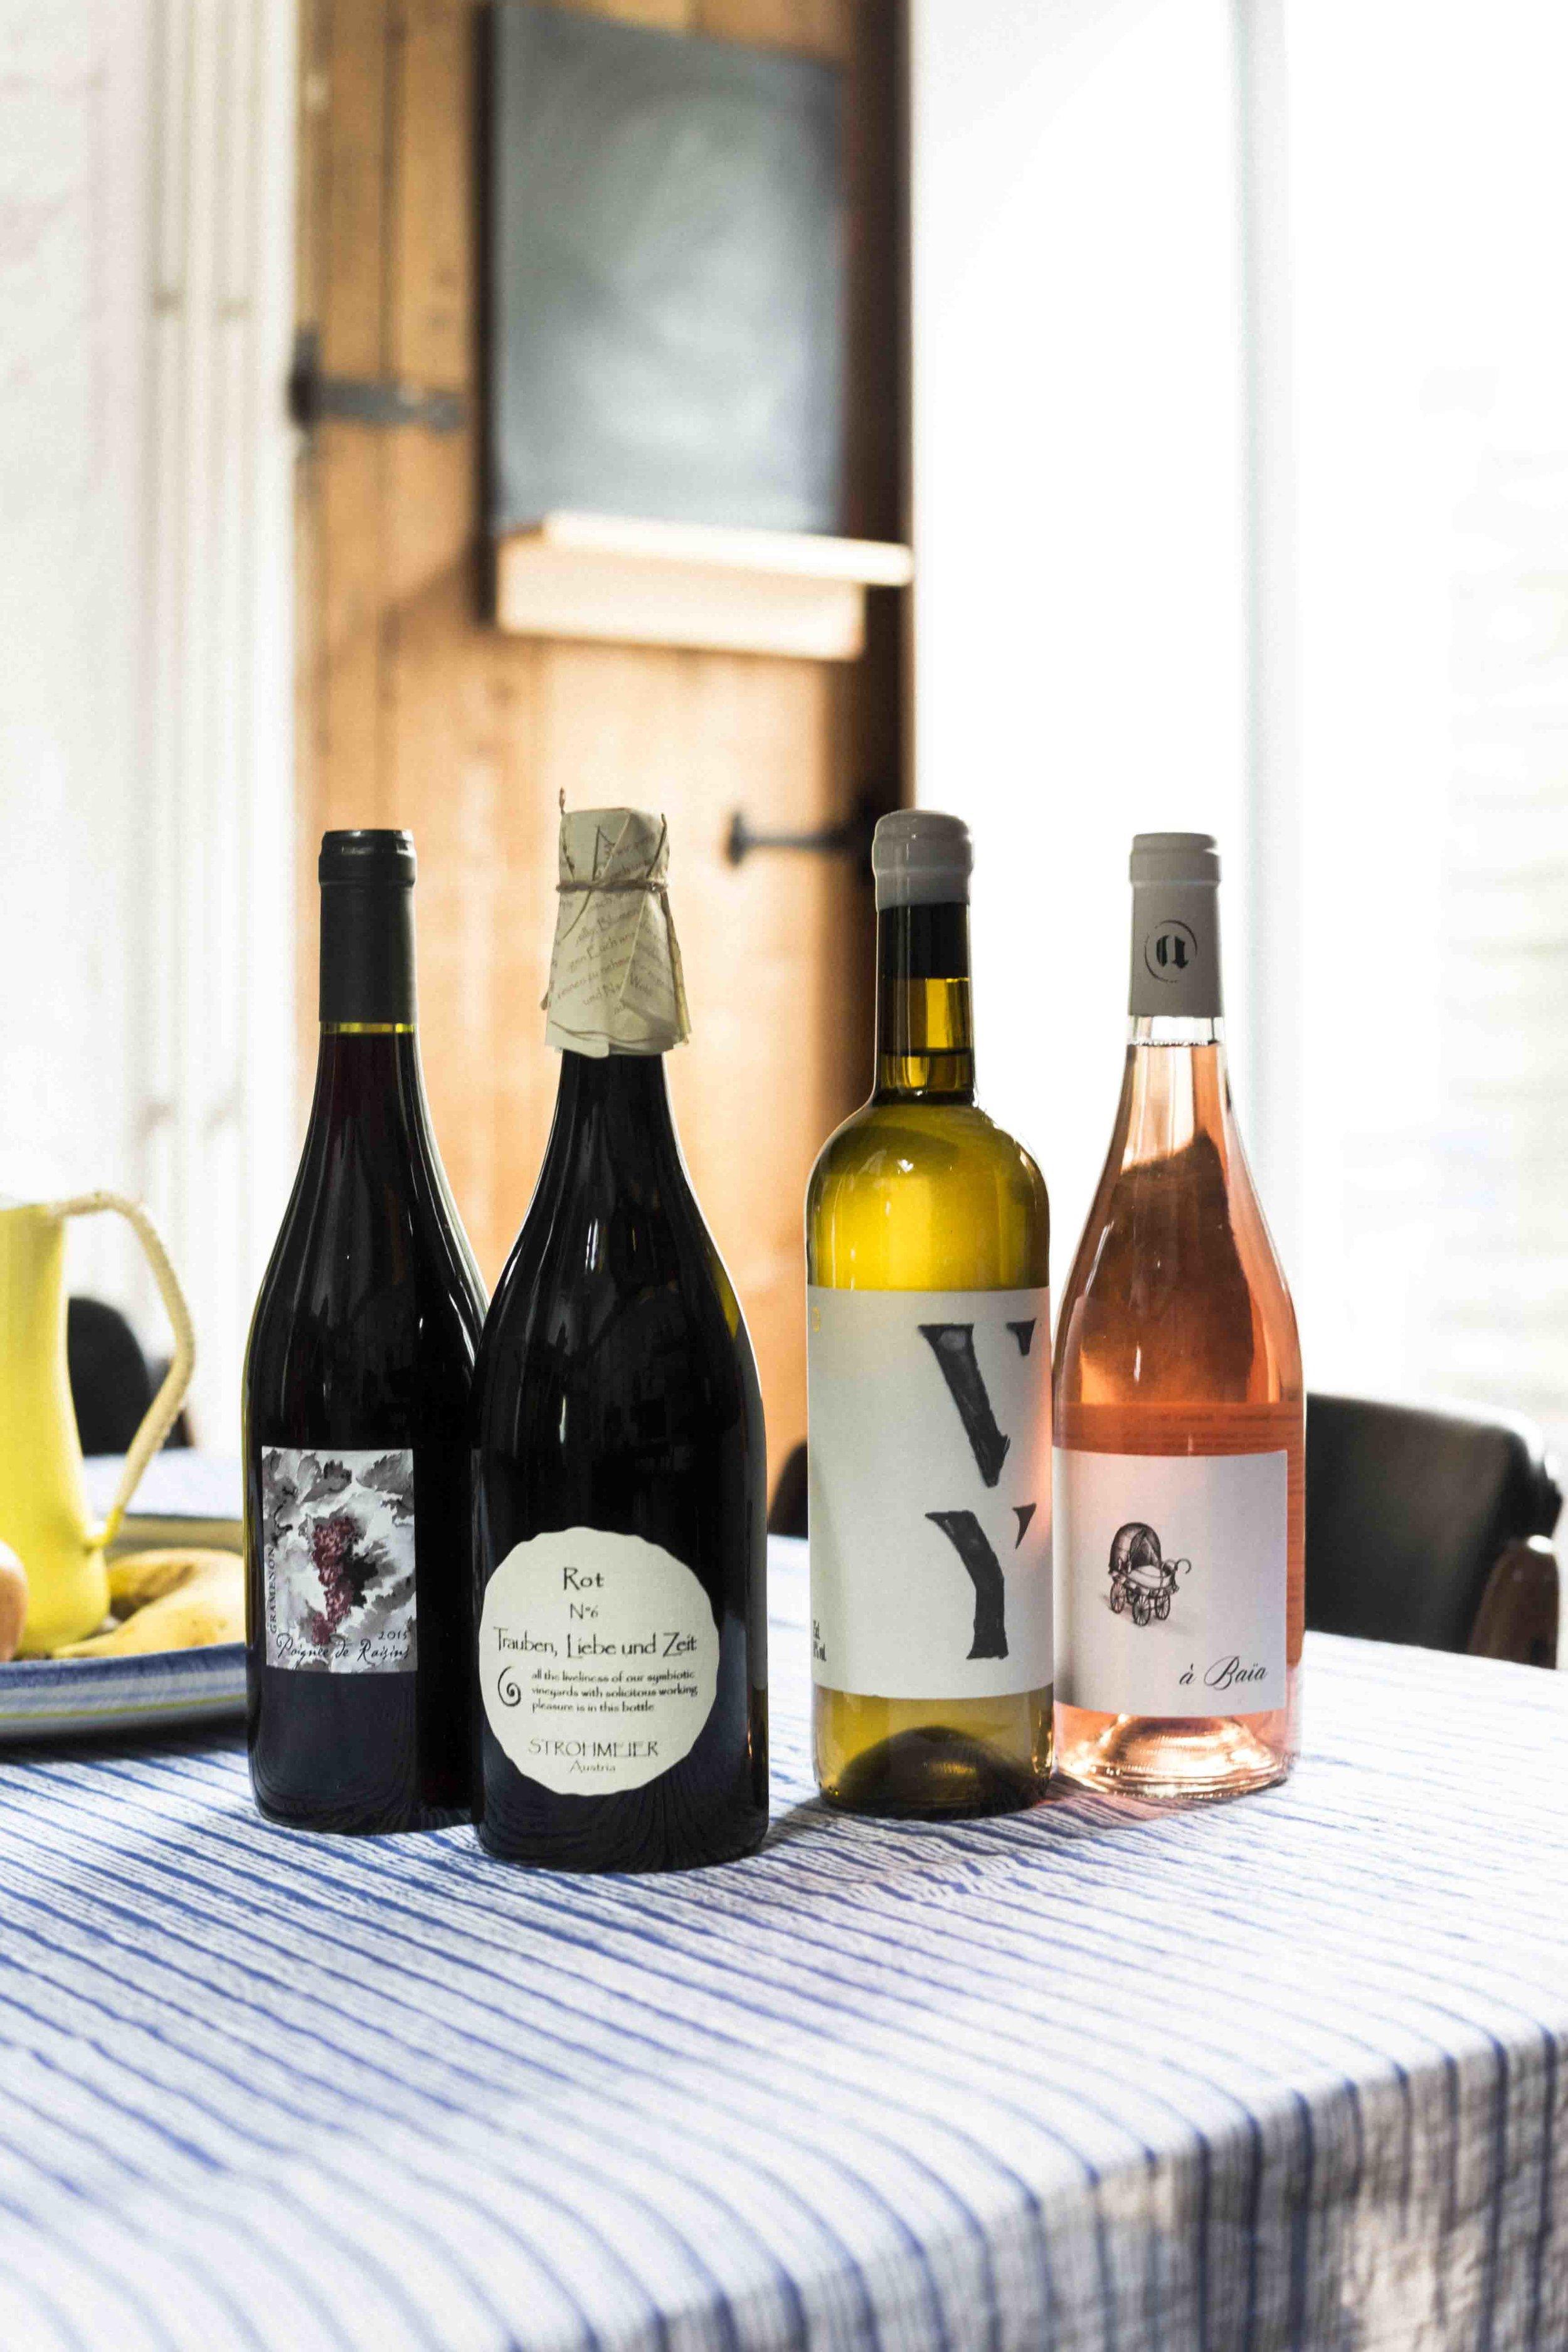 All Natural Born Wine HQ photos © Daisuke Taniguchi